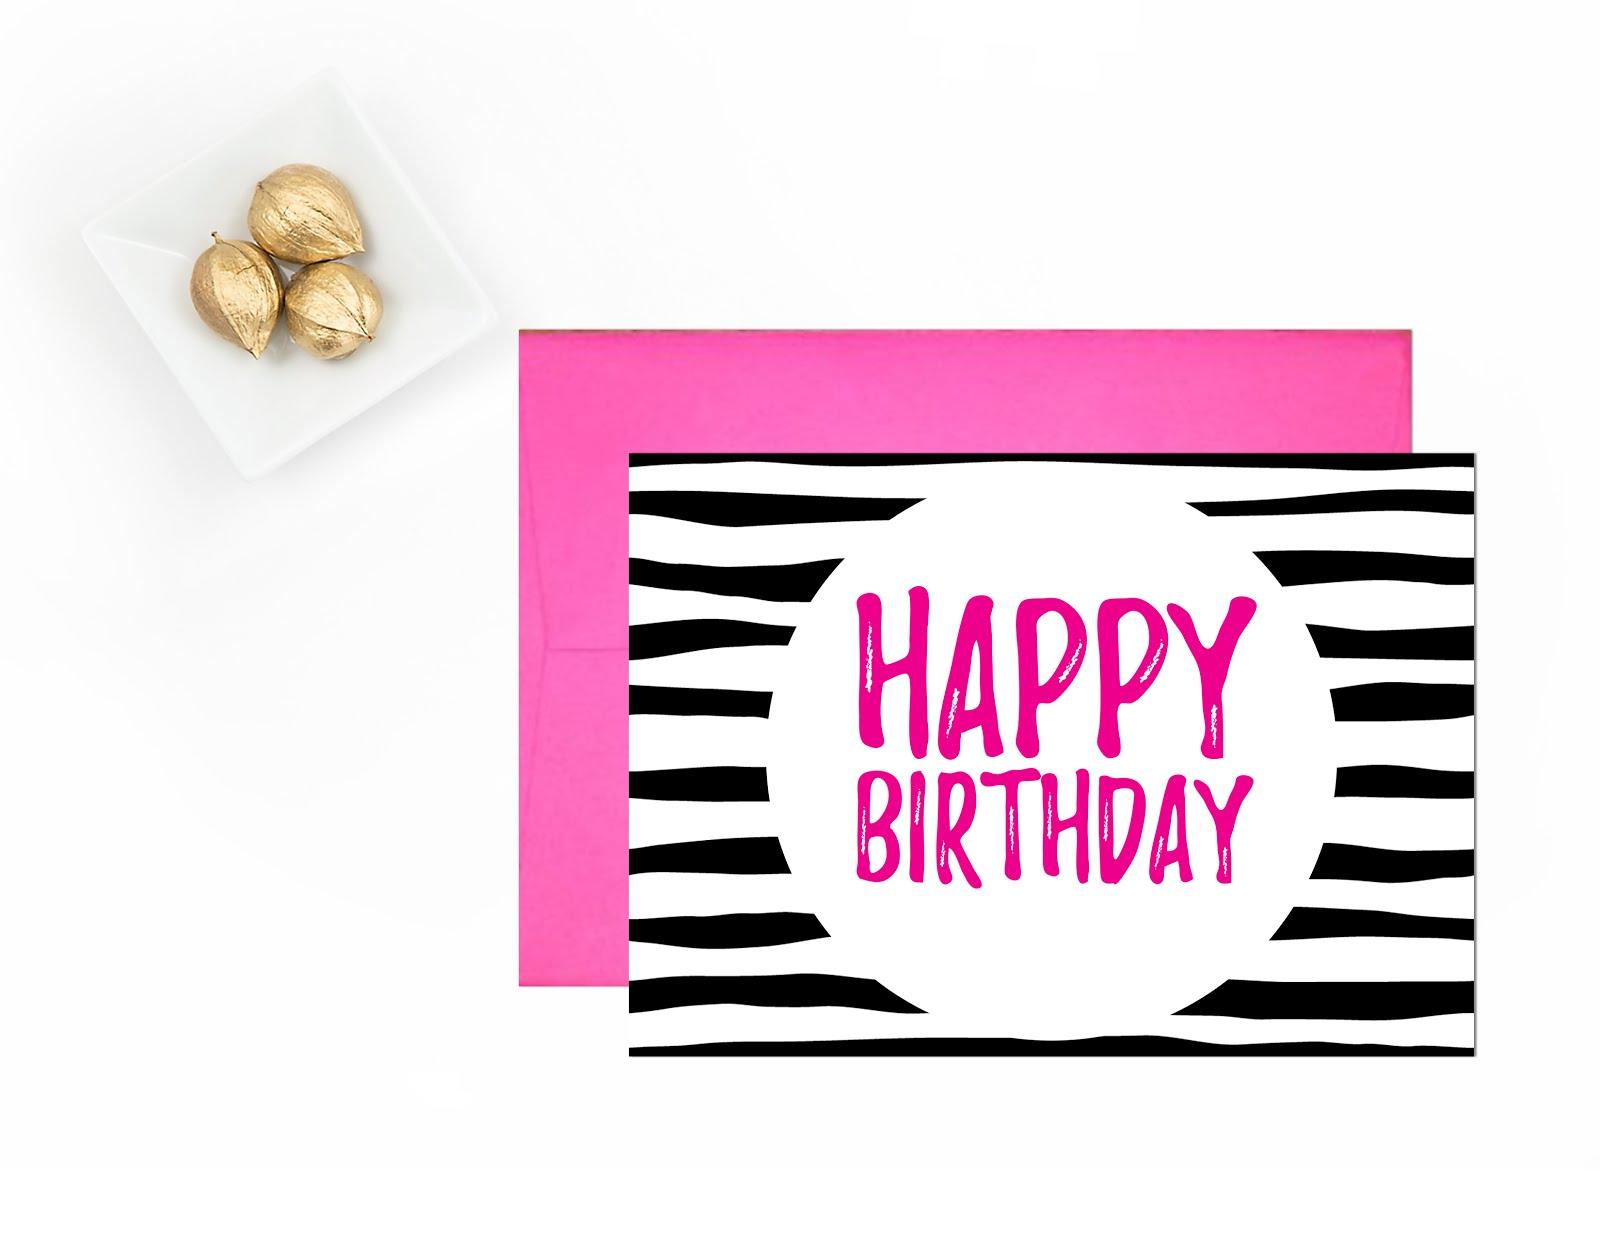 Happy Birthday | Free Printable Greeting Cards - Andree In Wonderland - Happy Birthday Free Cards Printable